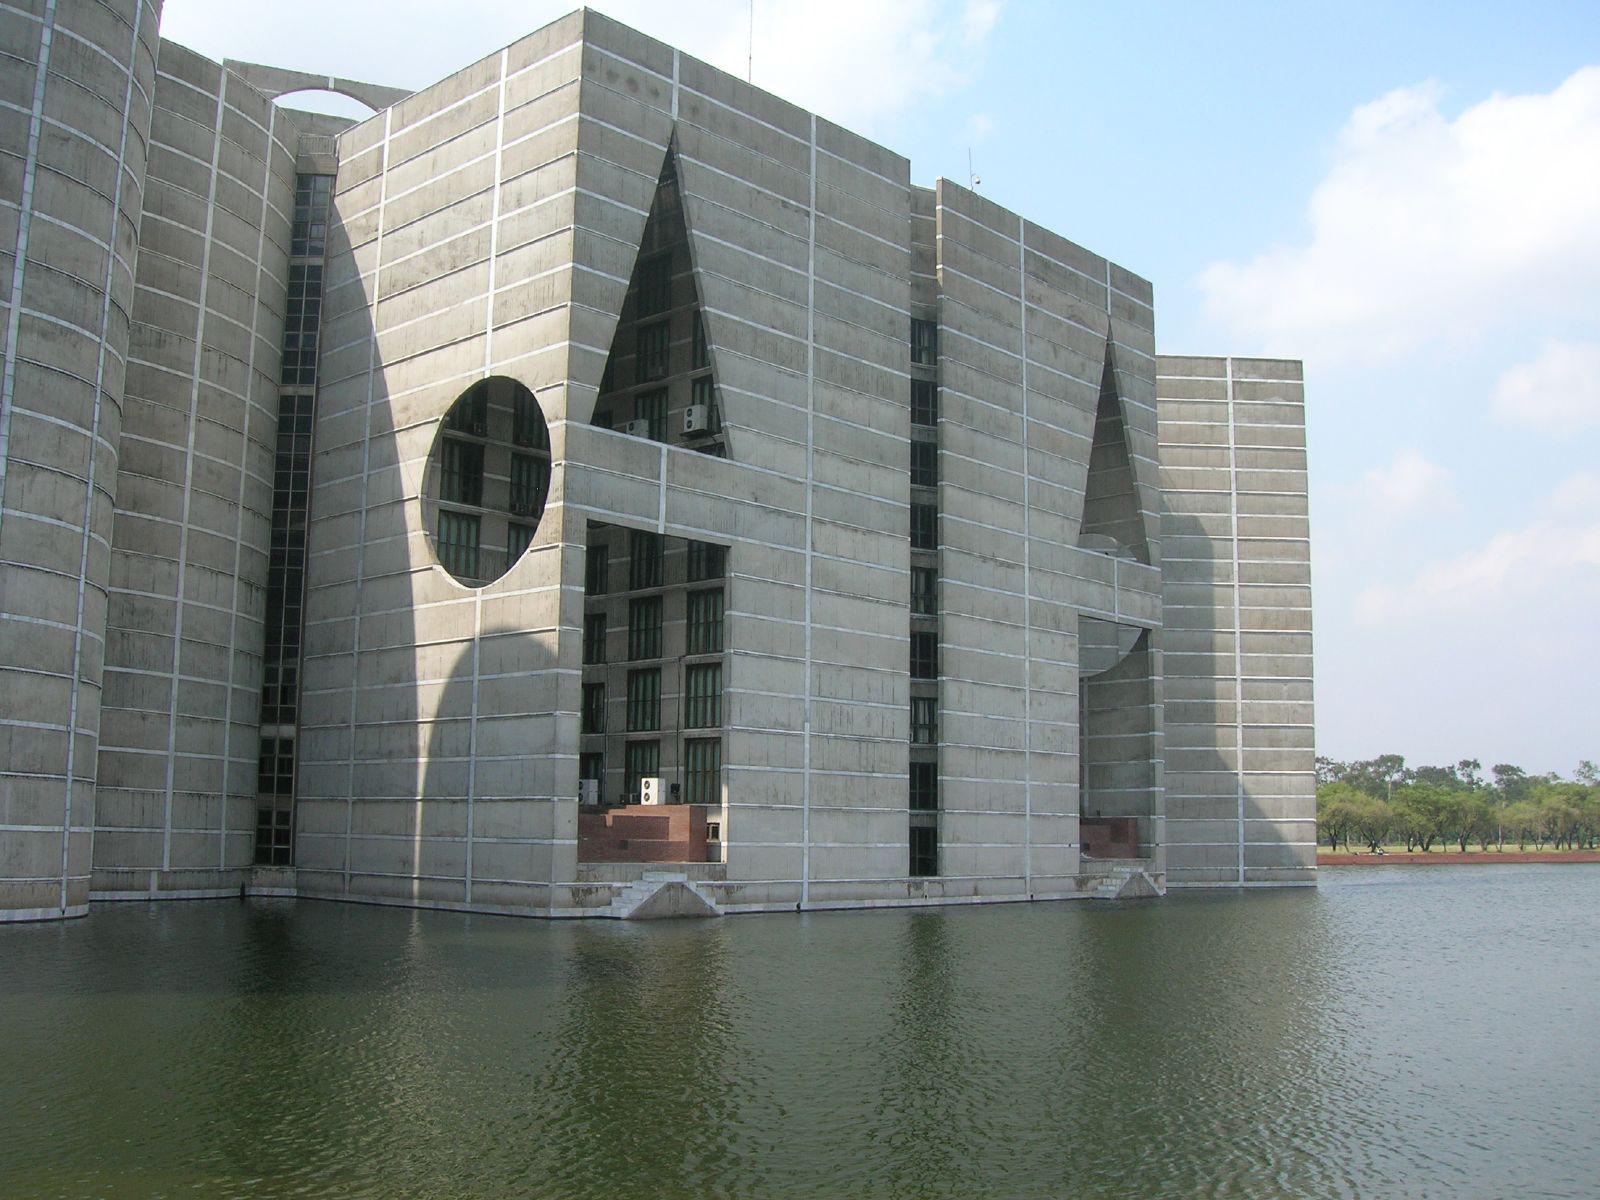 The modernist Jatiya Sangsad Bhaban or National Parliament House of Bangladesh, designed by Louis Kahn and Muzharul Islam